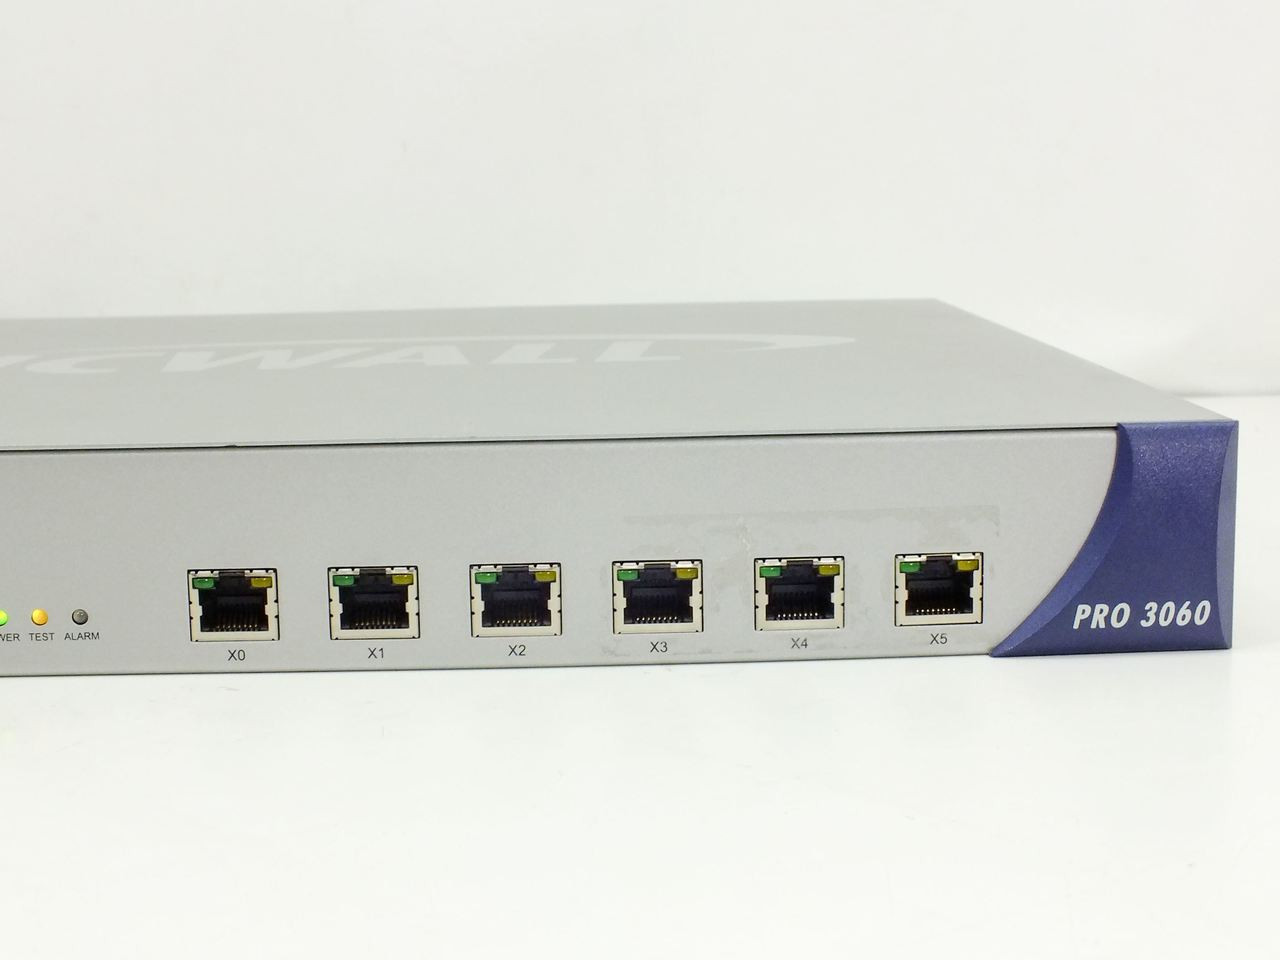 Sonicwall Pro 100 firmware